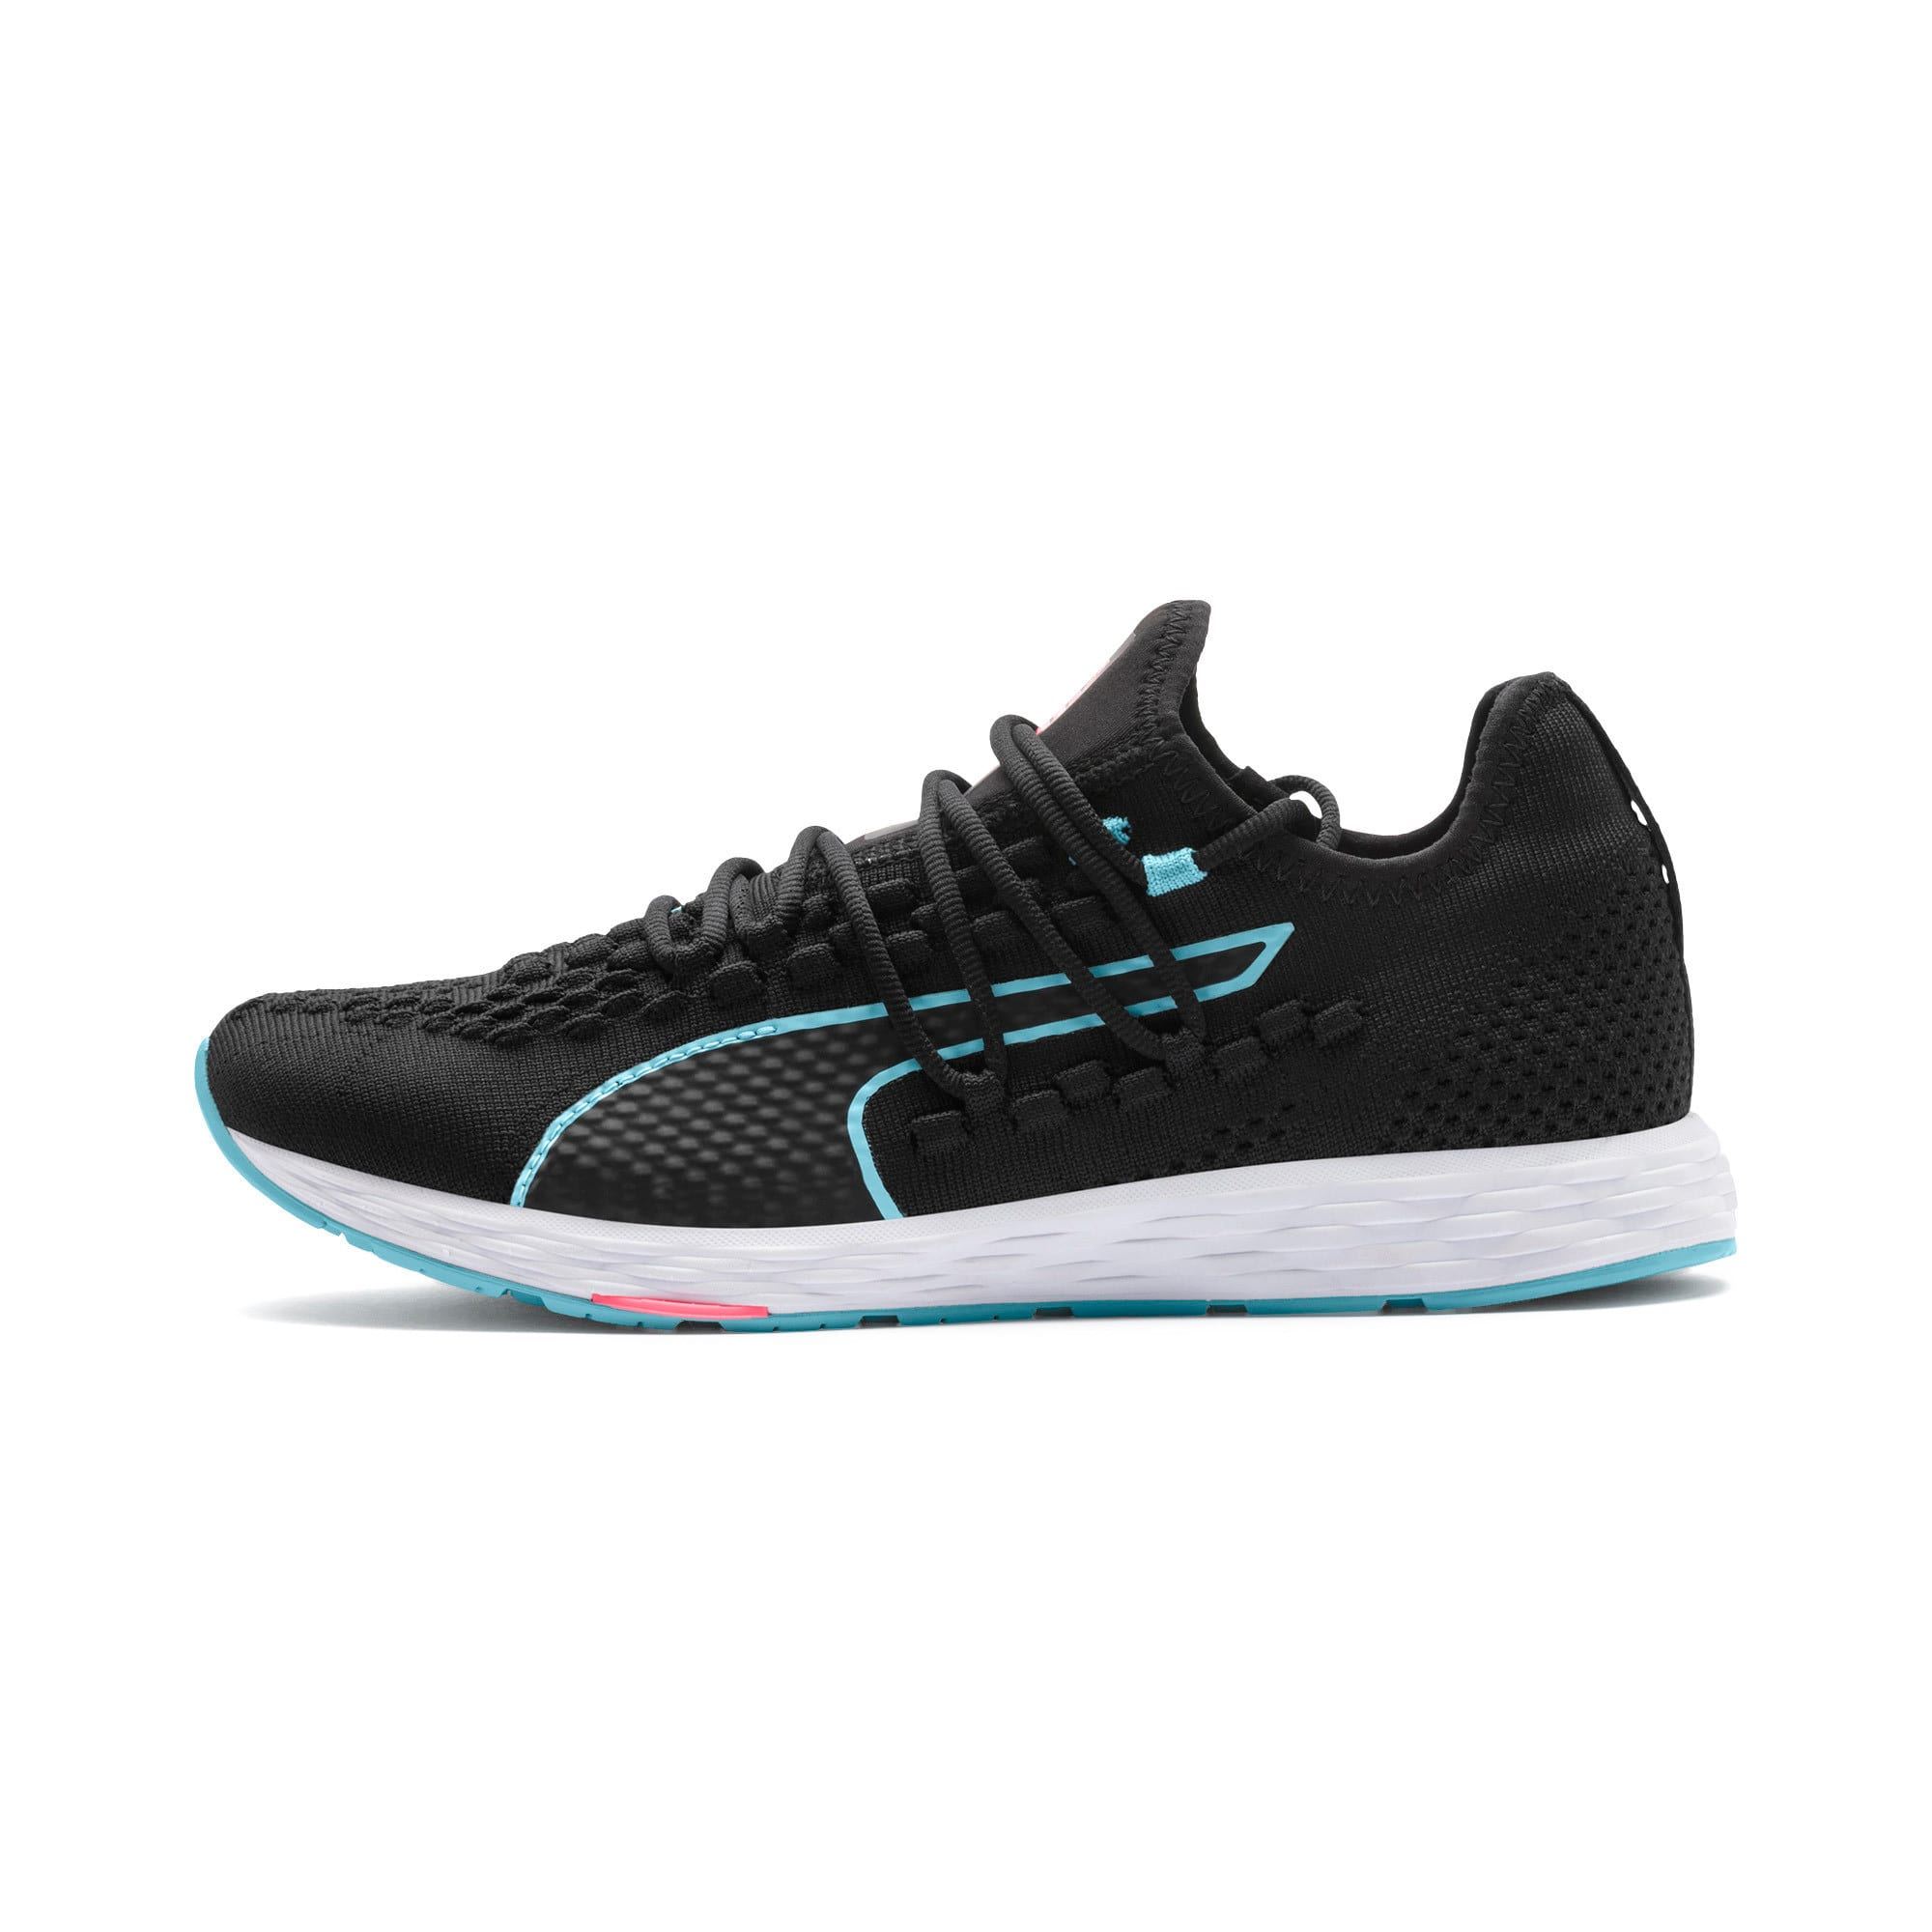 Thumbnail 1 of SPEED RACER Women's Running Shoes, Black-Milky Blue-Pink Alert, medium